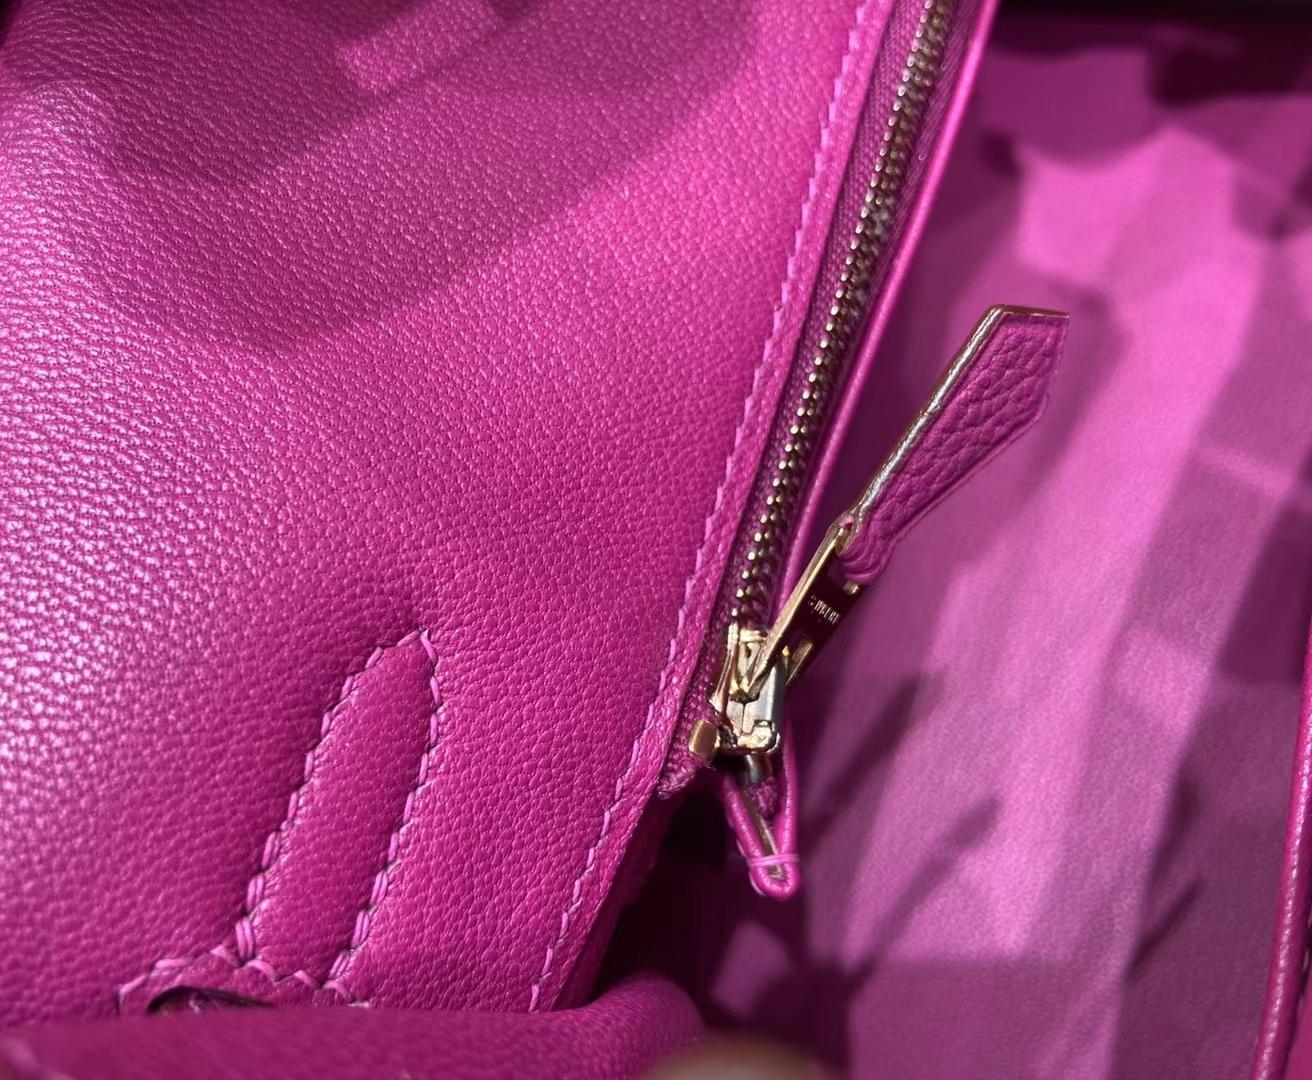 Hermès(爱马仕)Birkin 铂金包 法国togo 奶昔白 拼 玫瑰紫 金扣 25cm 顶级纯手工 现货